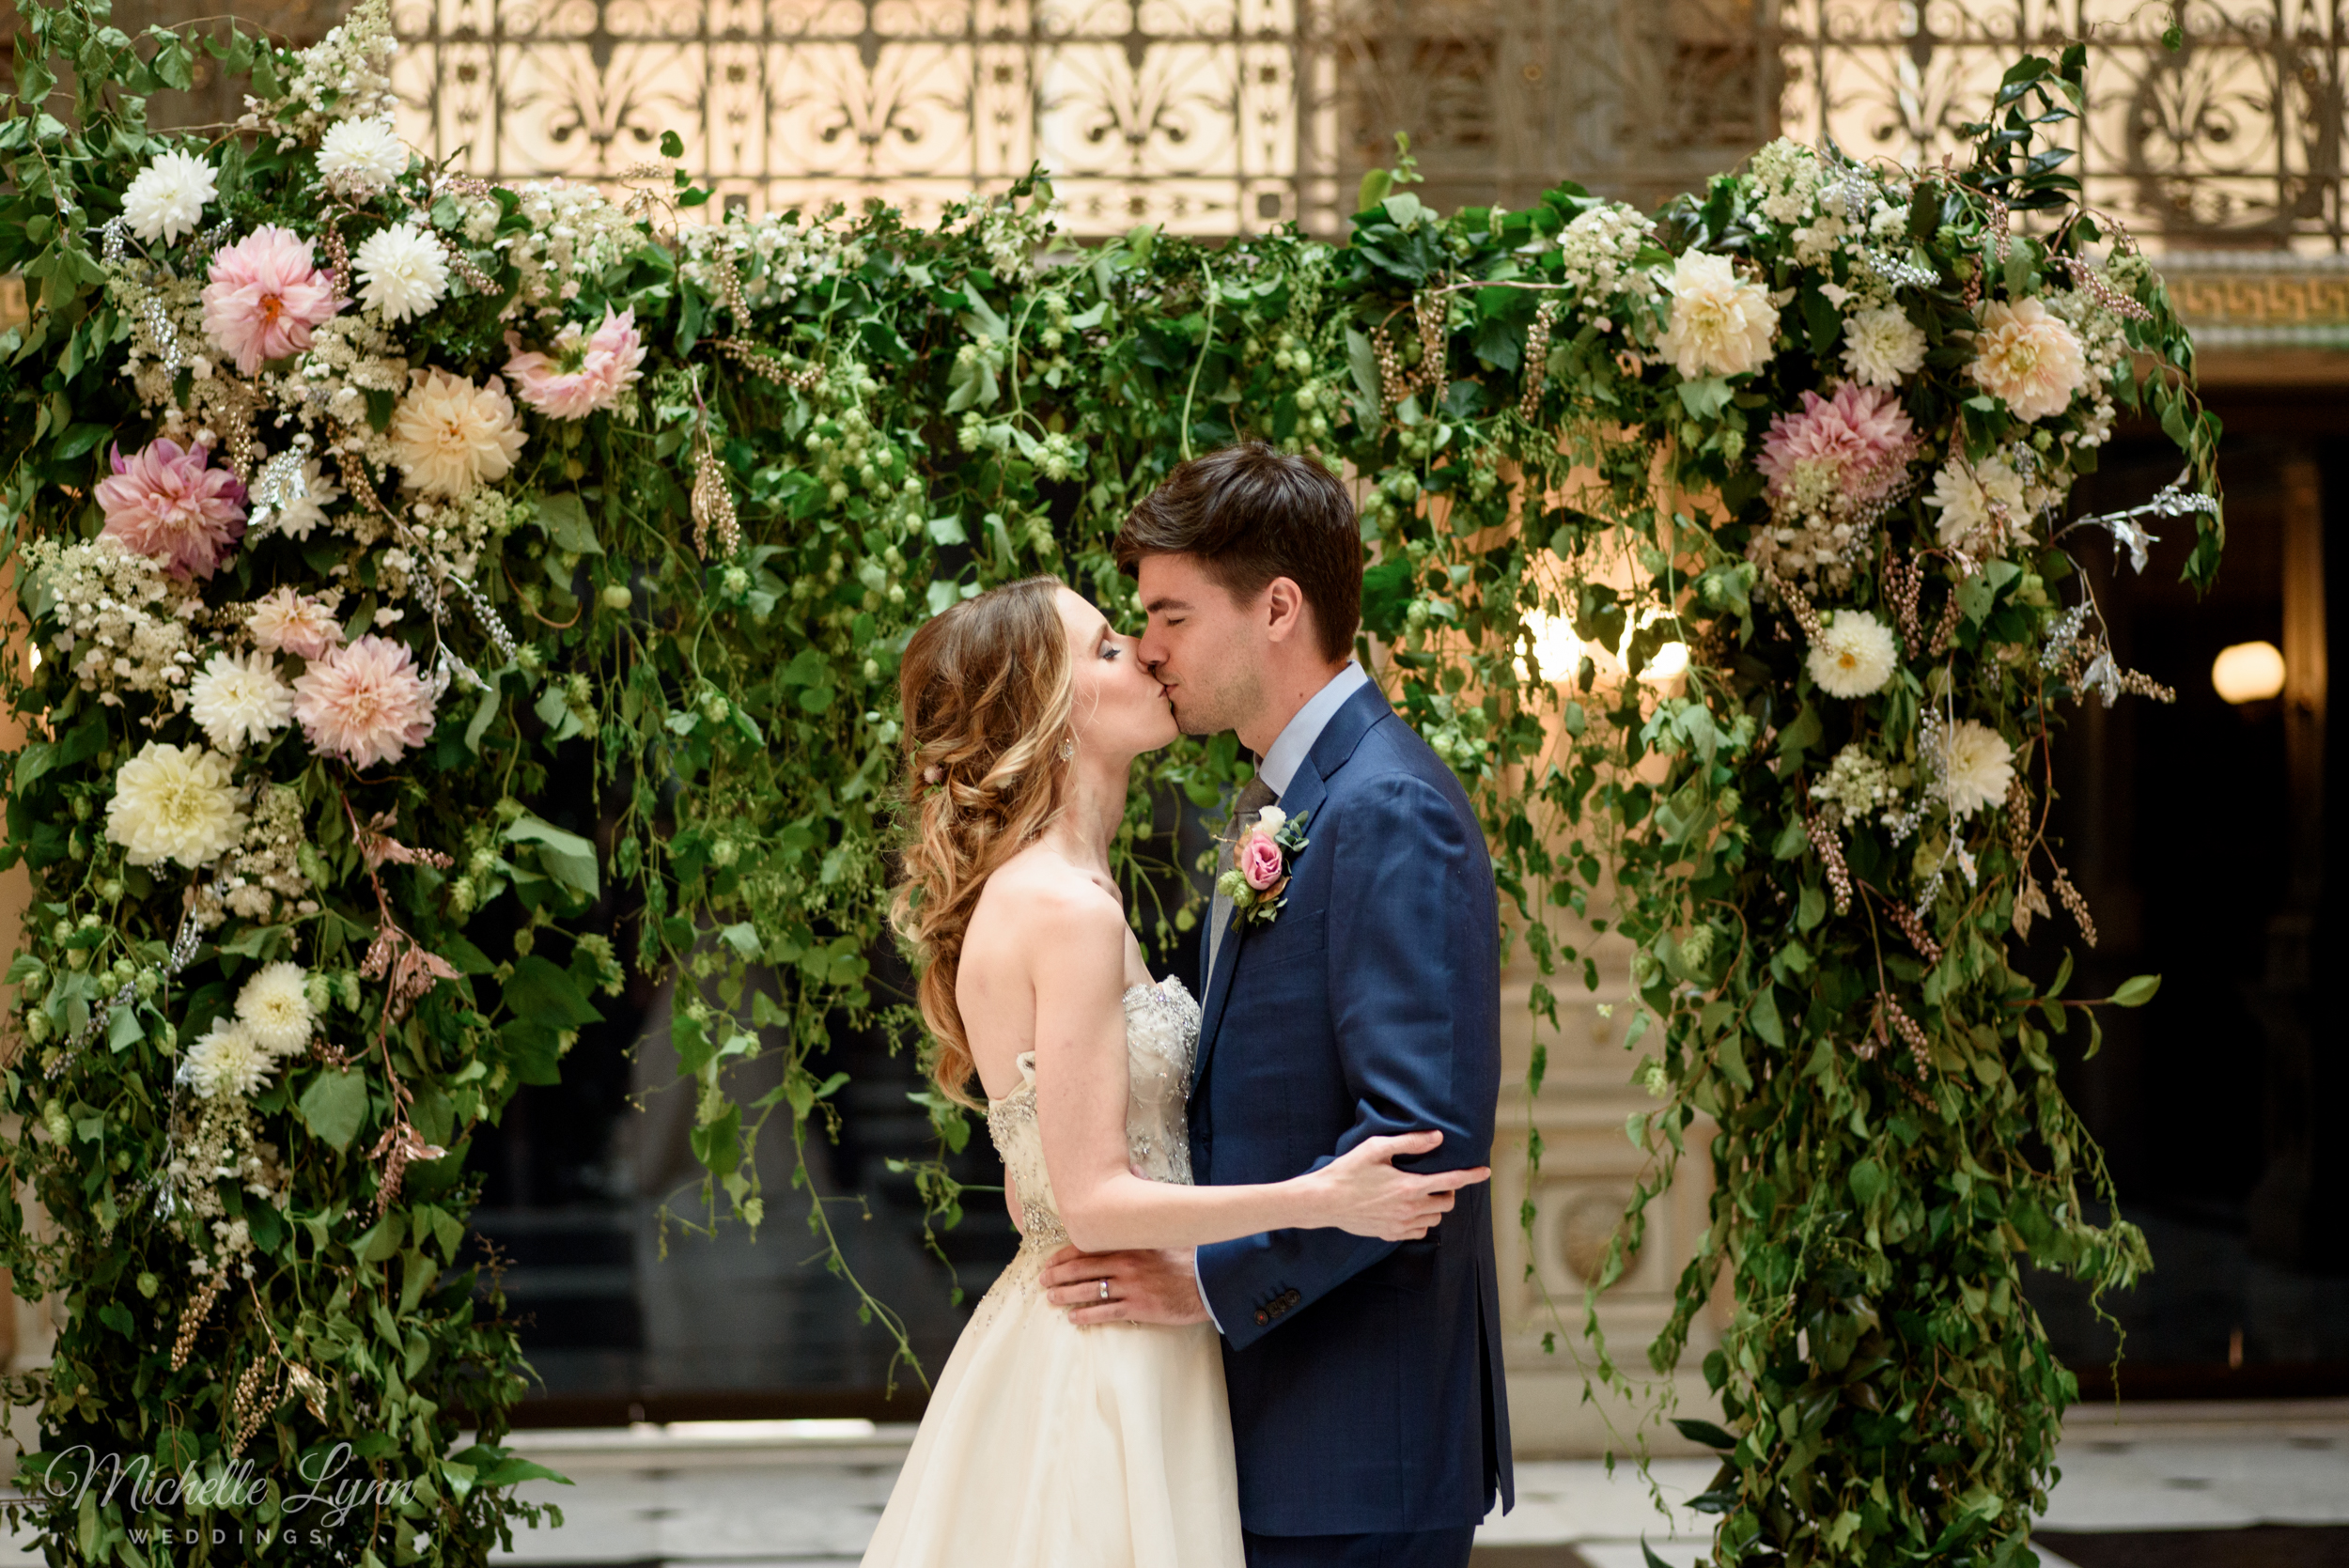 George_Peabody_Library-Wedding_Styled_Shoot-42.jpg